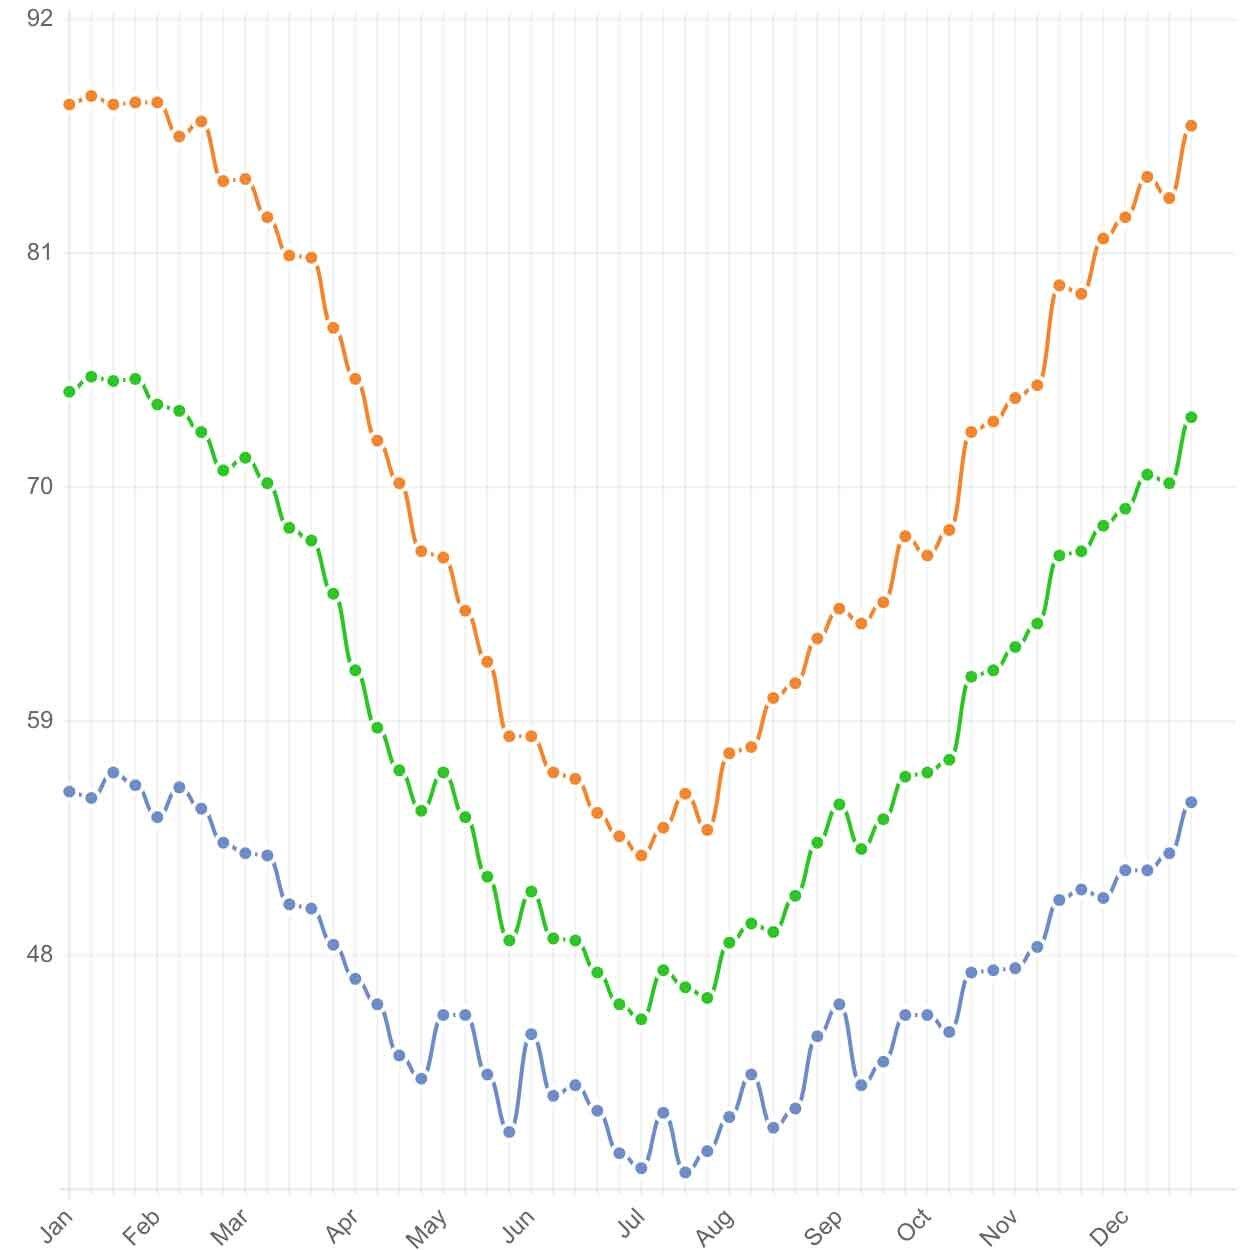 Colchagua Valley Weather in Fahrenheit:  Champion Traveller